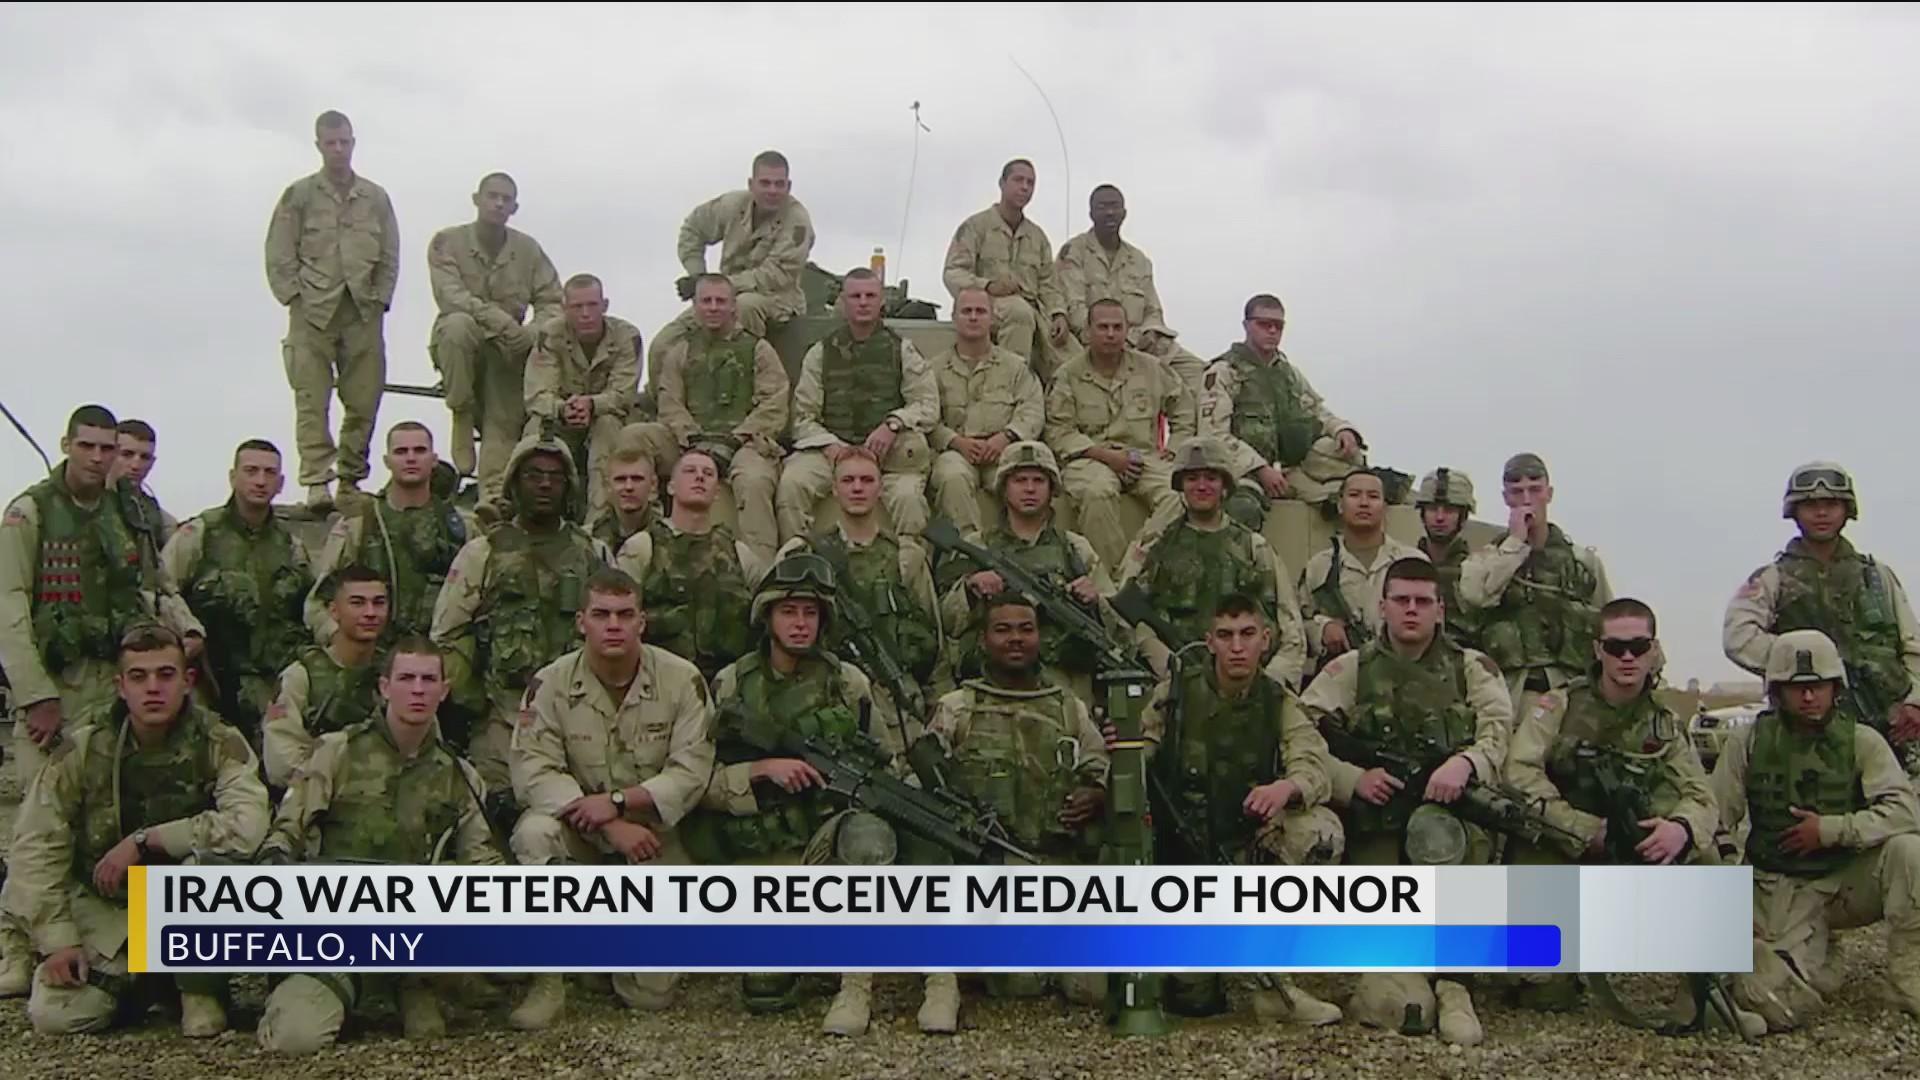 Iraq war veteran will receive Medal of Honor | KOLR